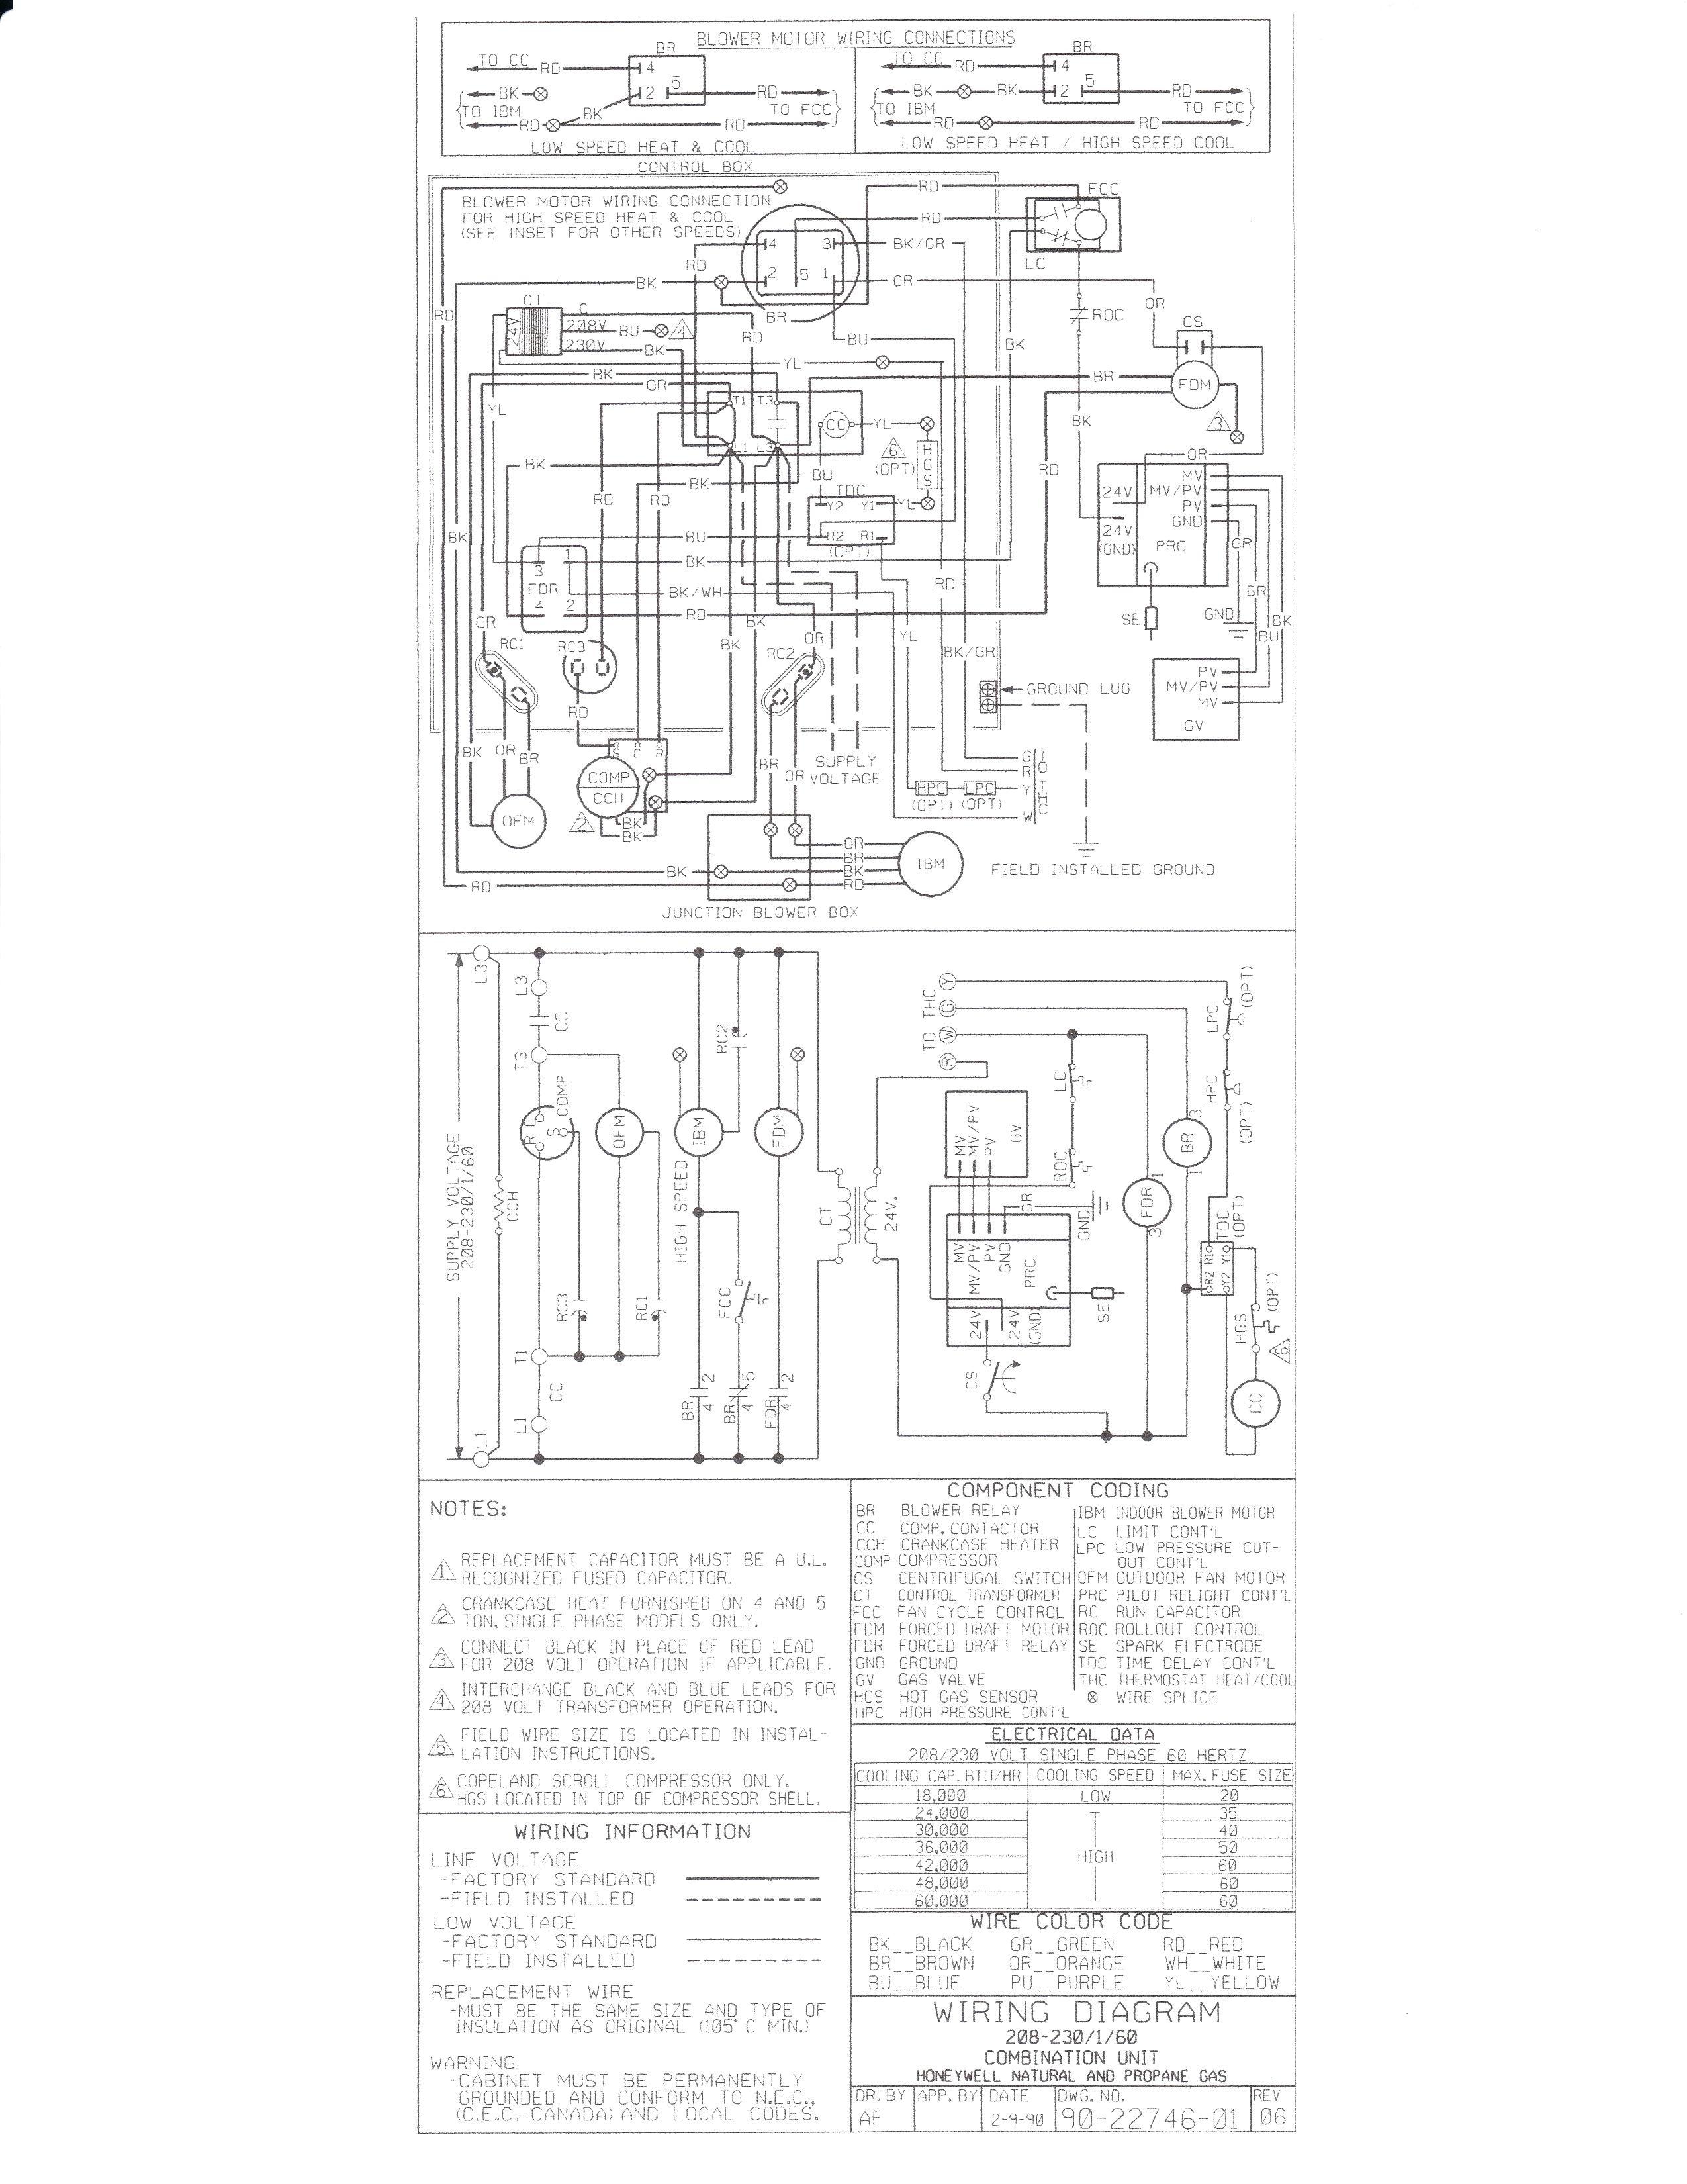 furnace drawing at getdrawings com